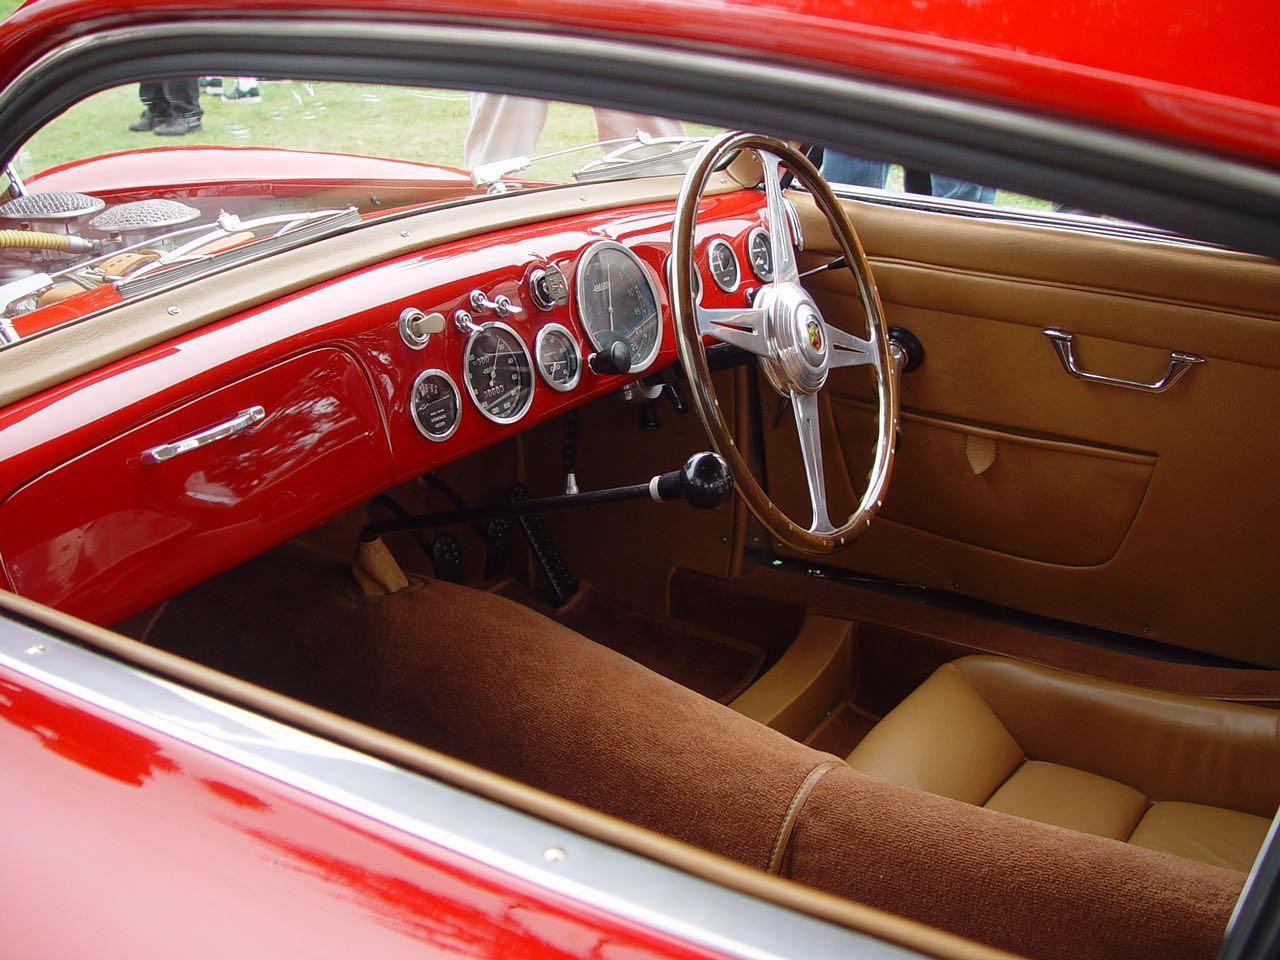 '51 Abarth 204 Berlinetta Corsa & 205 Berlinetta GT - Sublissima 4